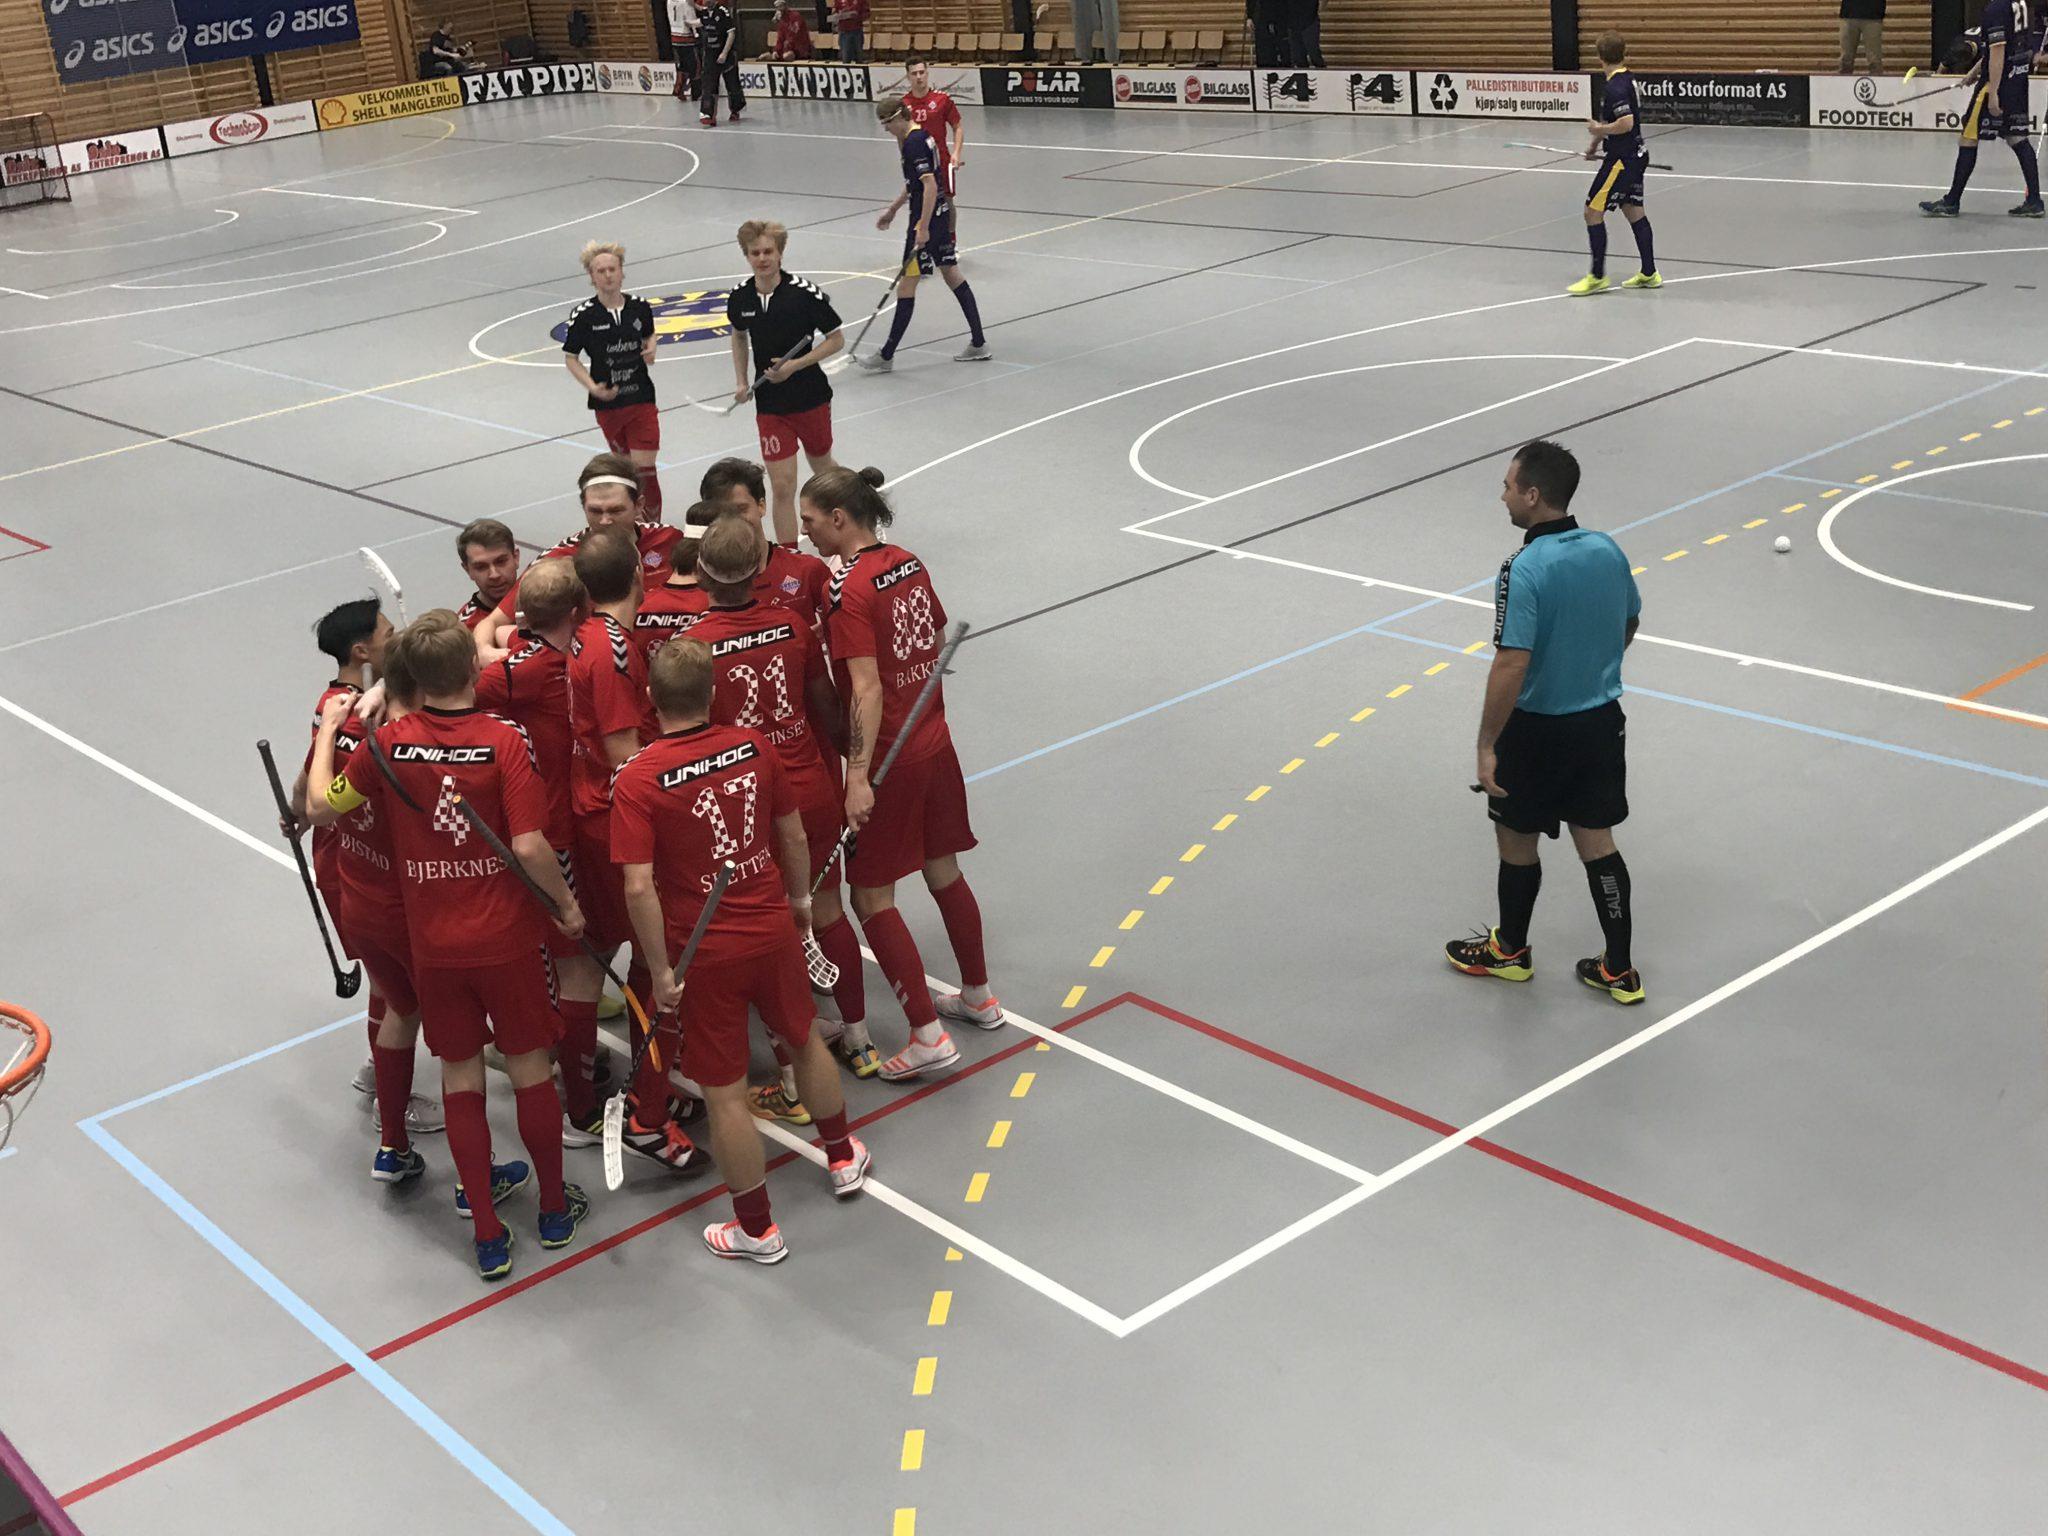 Semifinale to mellom Sveiva – Slevik spilles i kveld